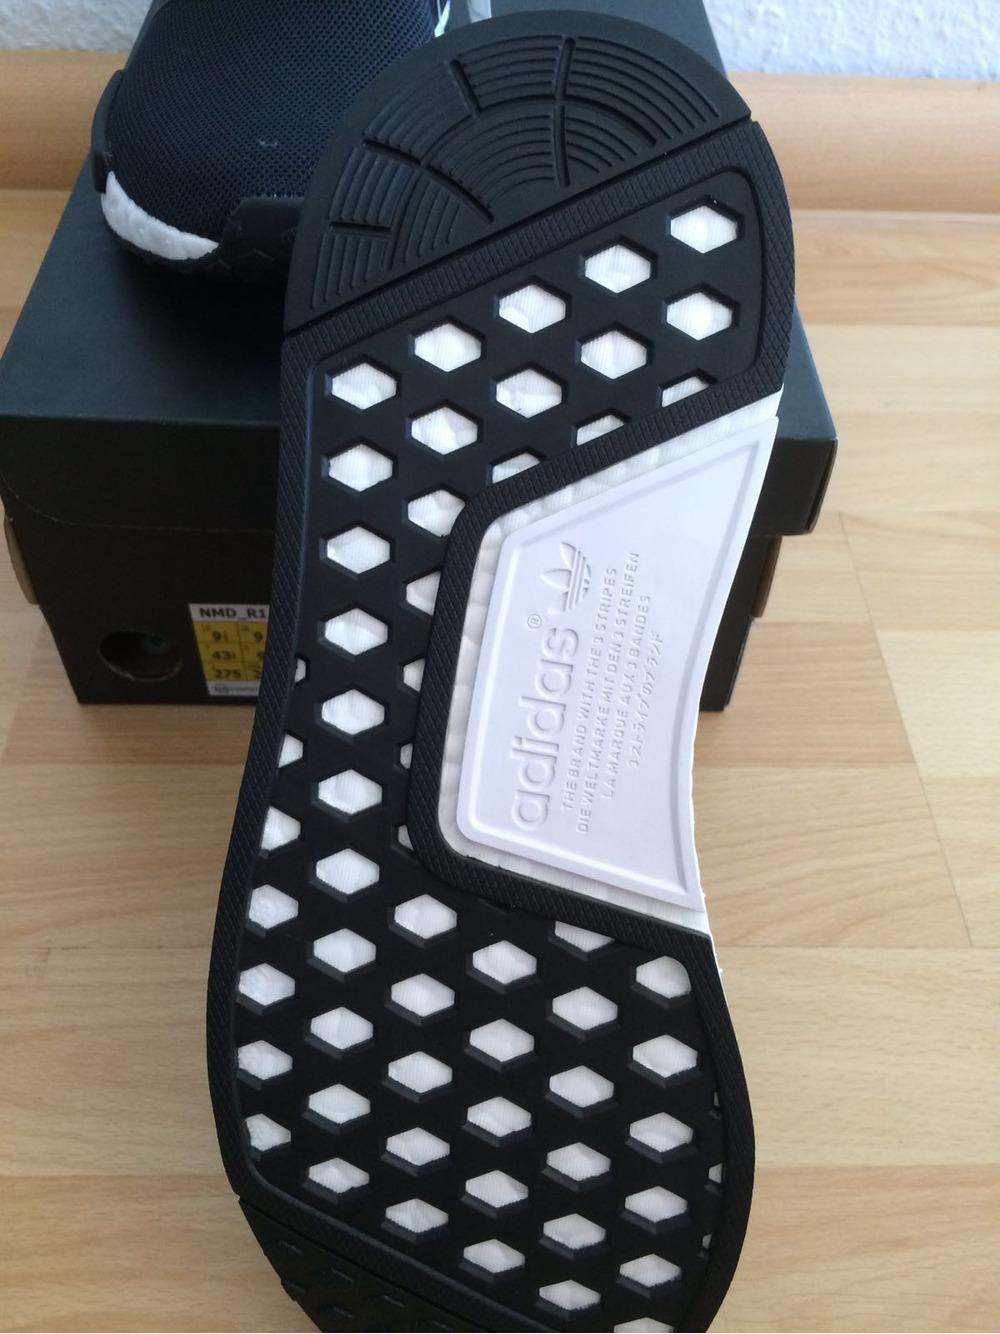 Adidas NMD R1 Tokyo Mesh Black White Blue S79162 UK6 8.5 EU39